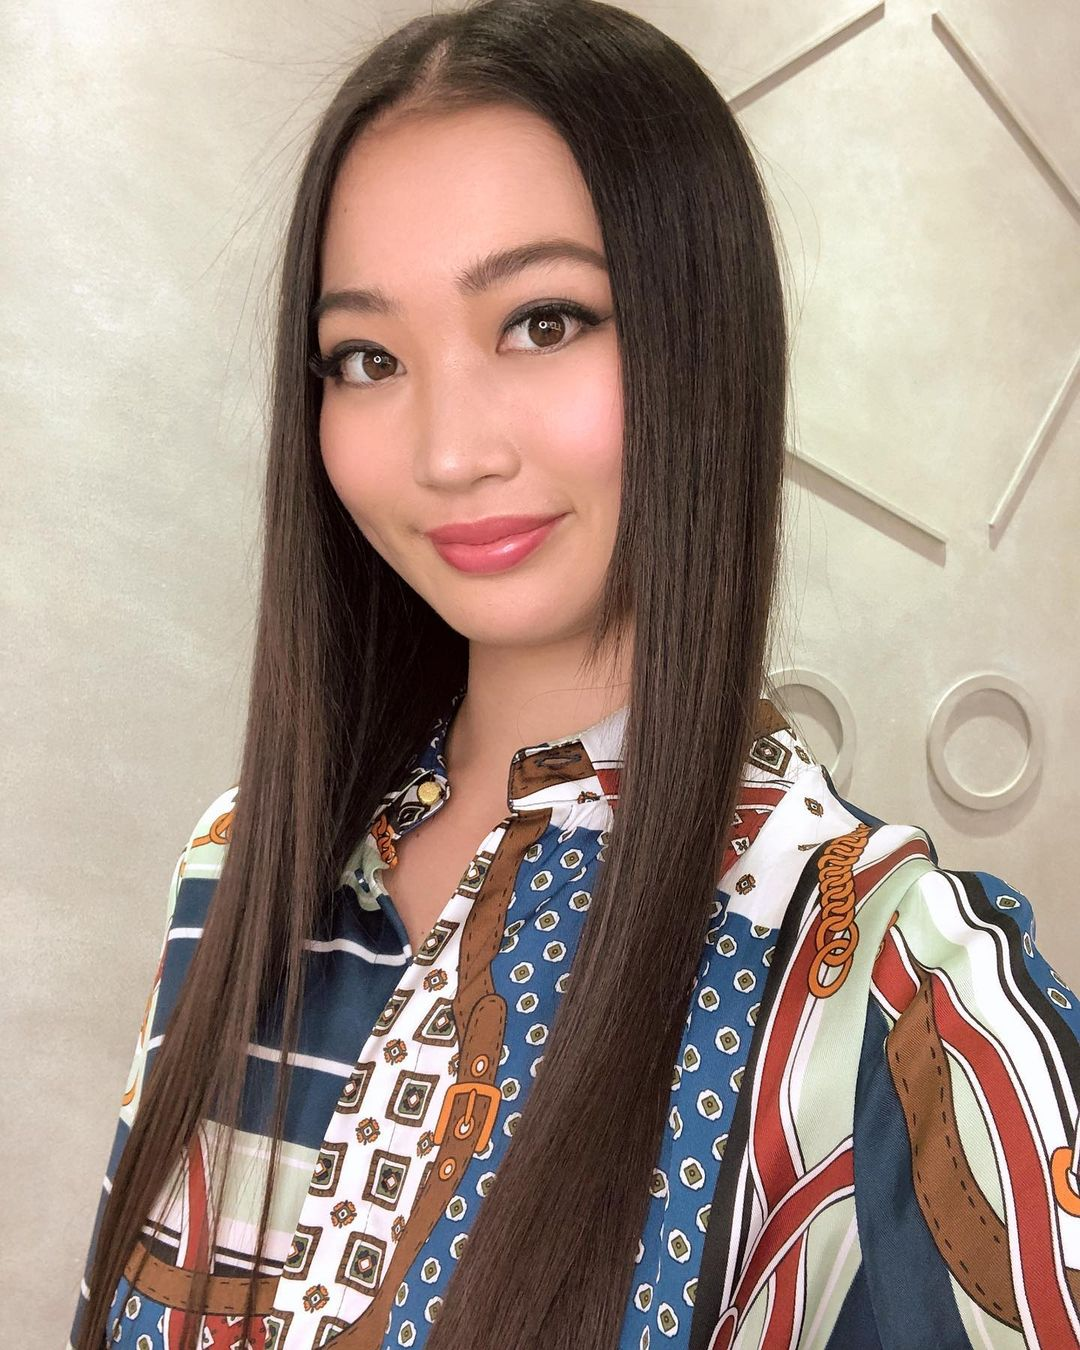 candidatas a miss universe japan 2020. final: 29 oct. - Página 2 6urdzv84